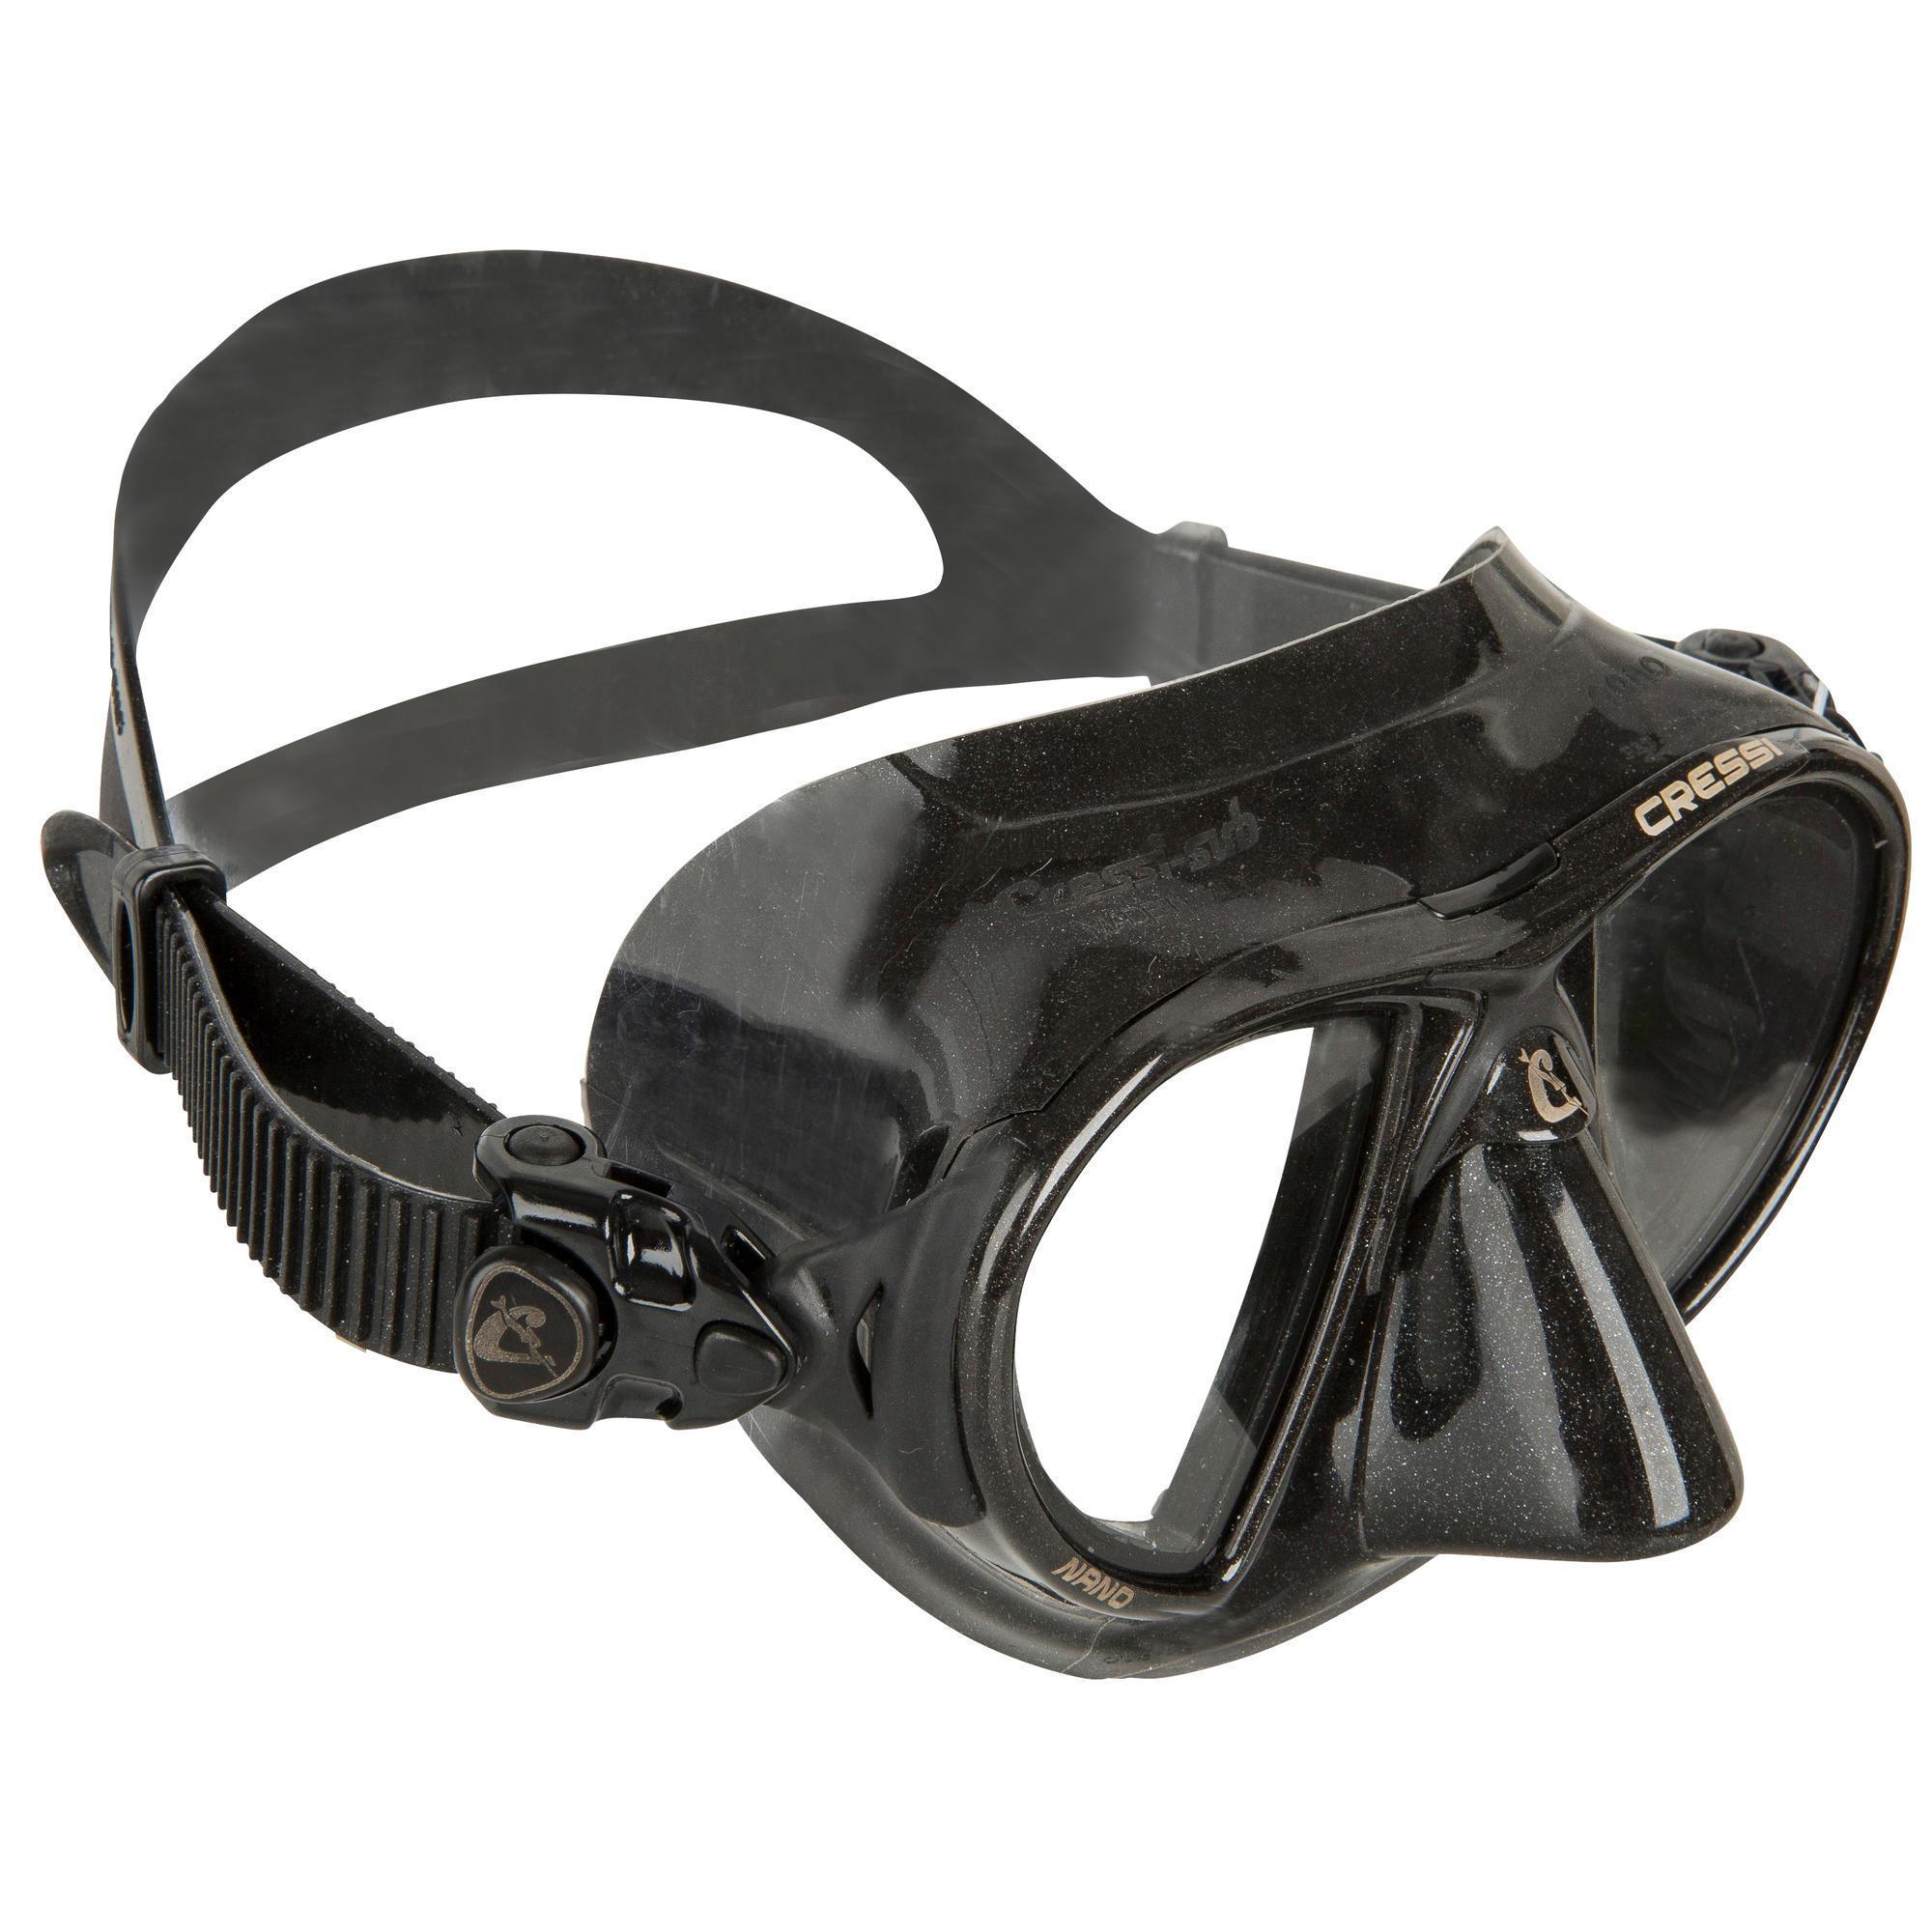 Cressi-sub Duikbril Nano Black en freediving kopen? Leest dit eerst: Duikmasker en snorkel Duikmasker met korting